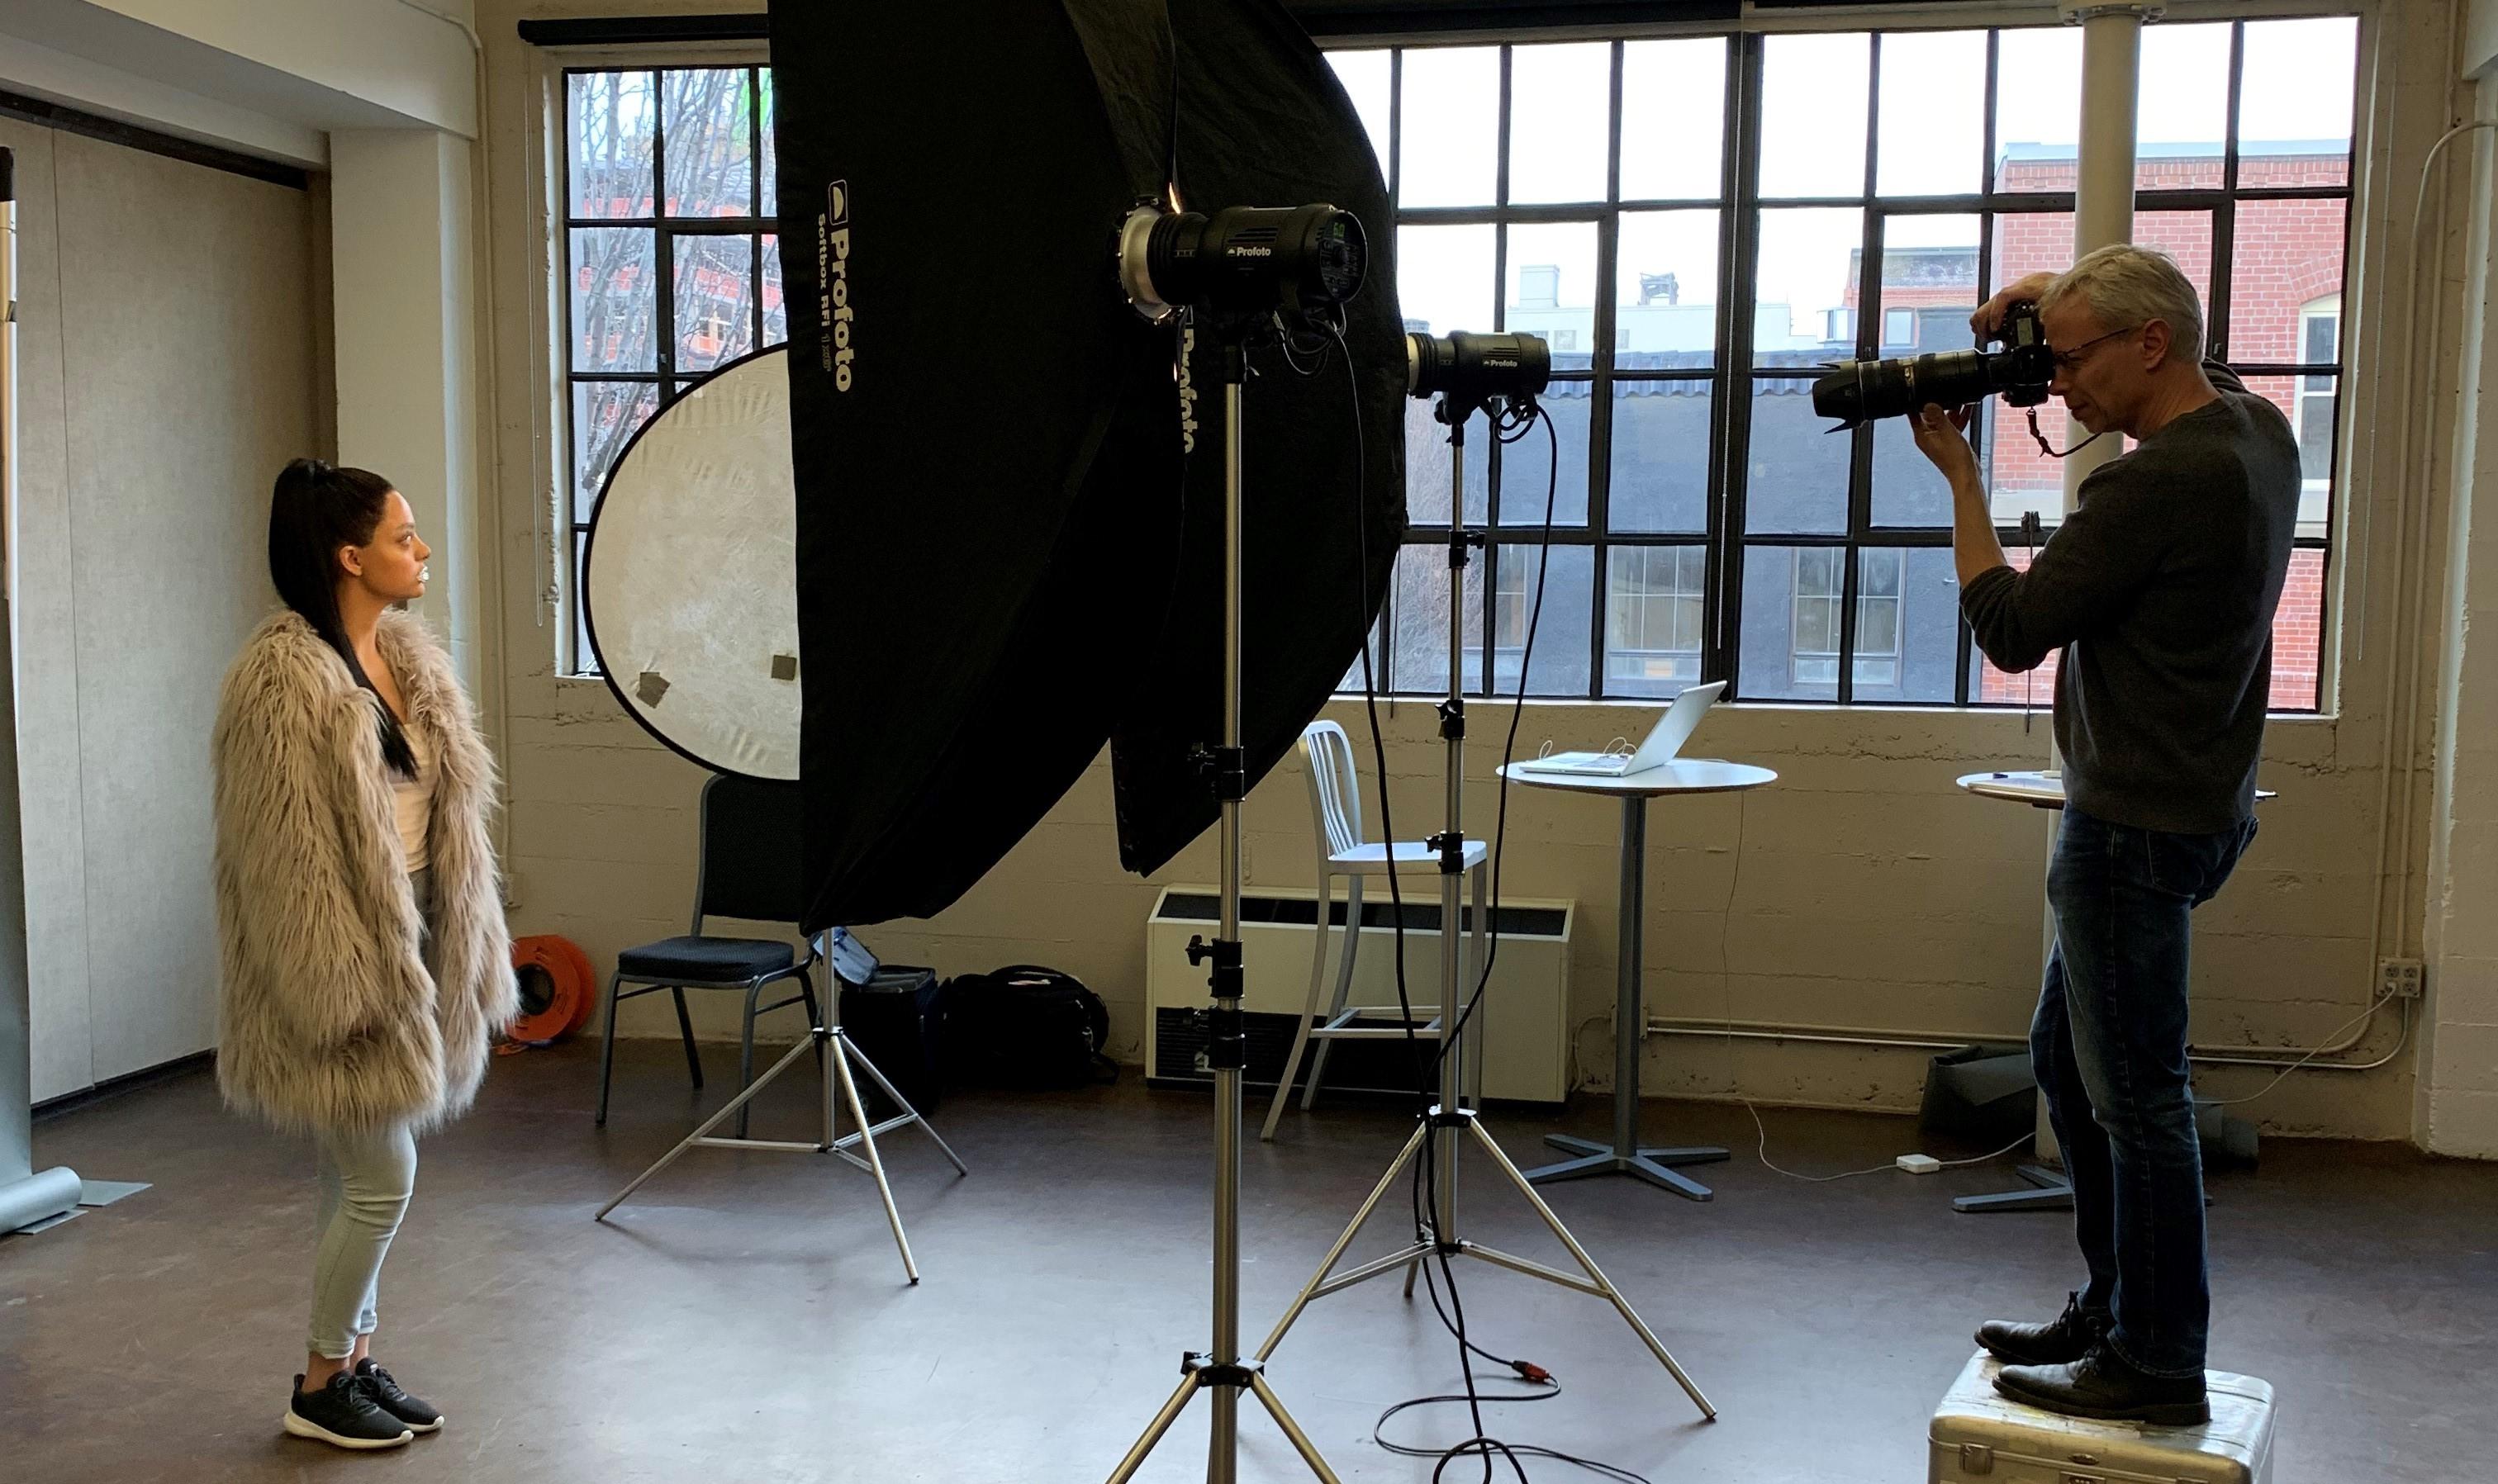 photoshoot, student work, avant garde, studio, photographer, editorial